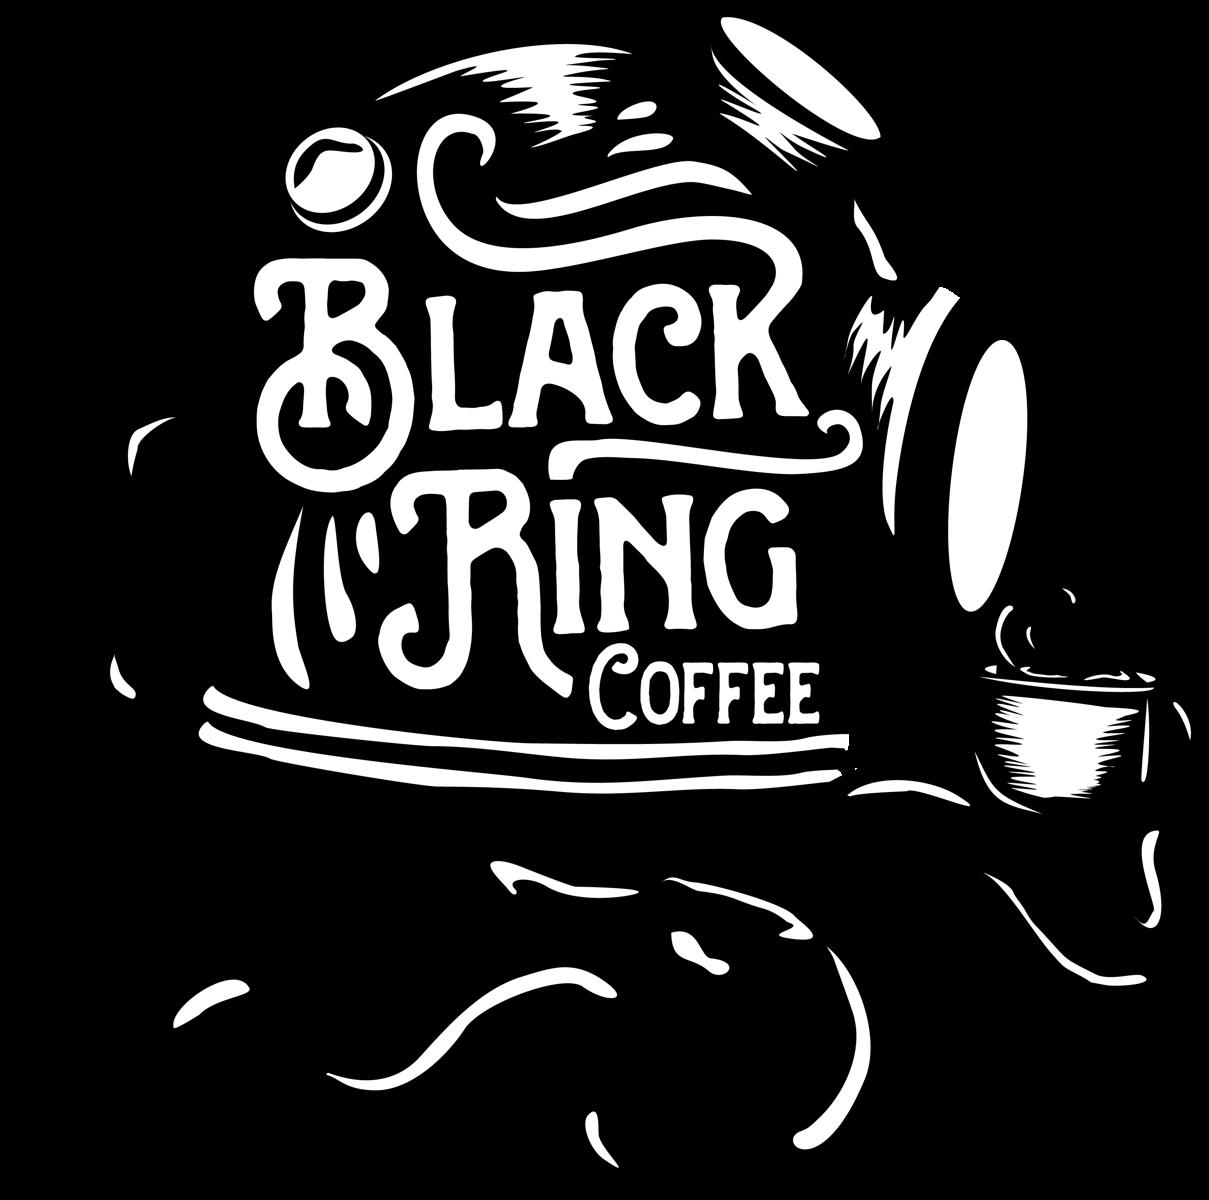 black scuba diving coffee helmet logo design